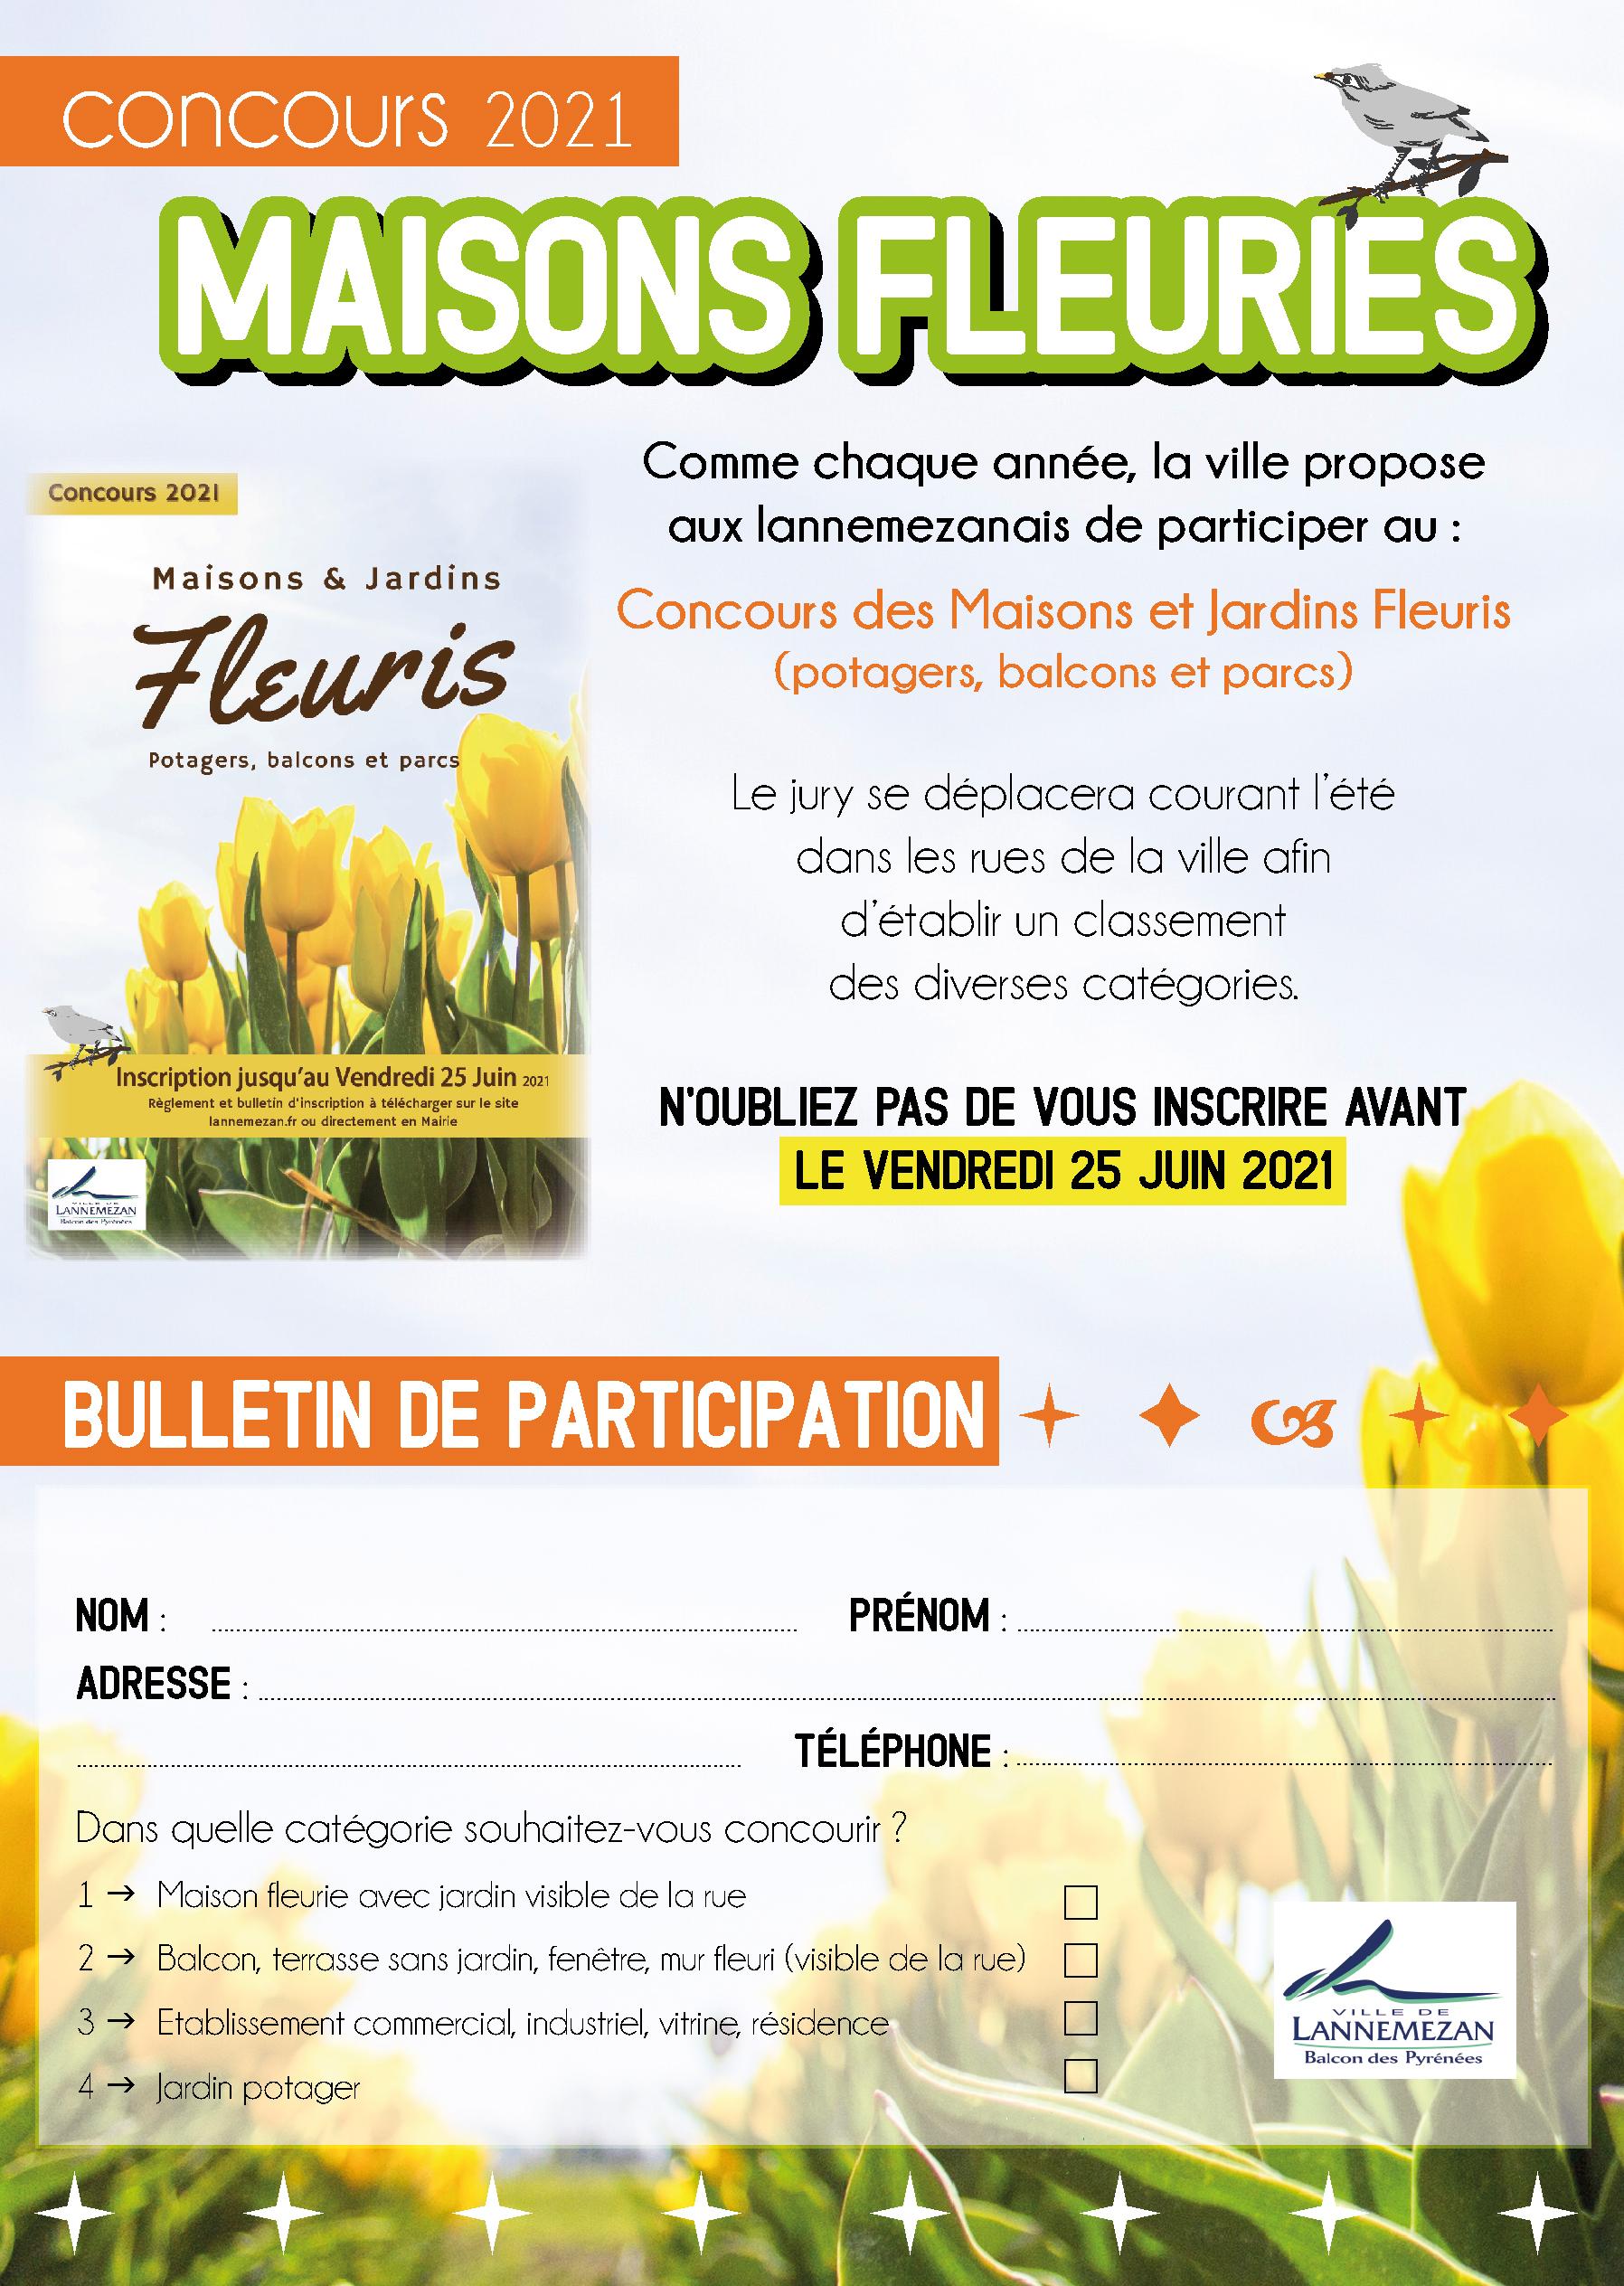 concours-maisons-fleuries-bulletindeparticipation.jpg